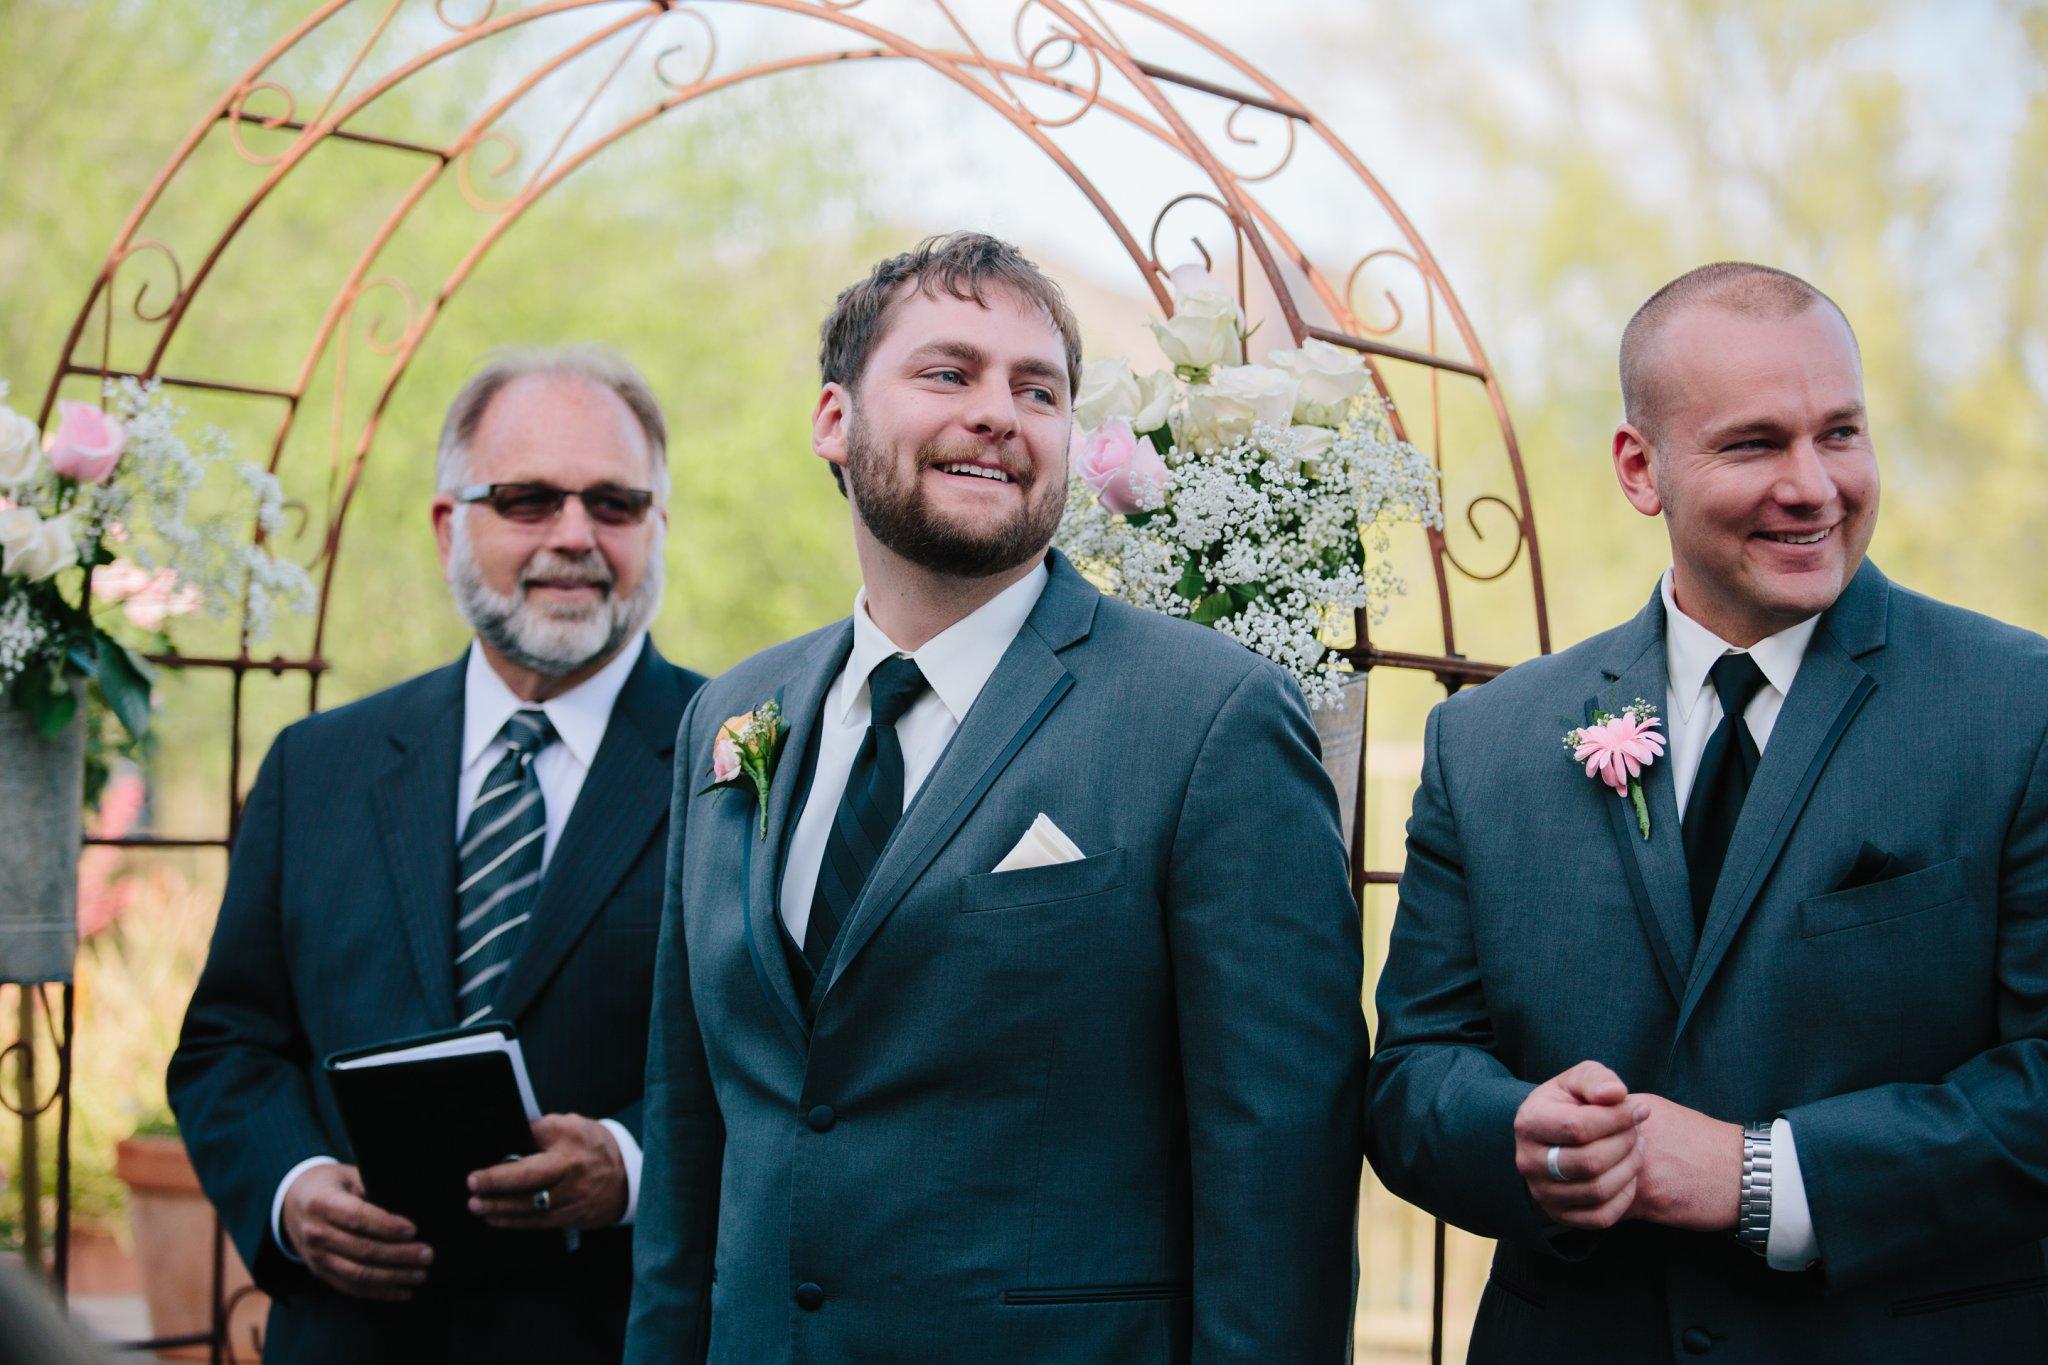 Arizona backyard wedding bride groom seeing bride walk down aisle